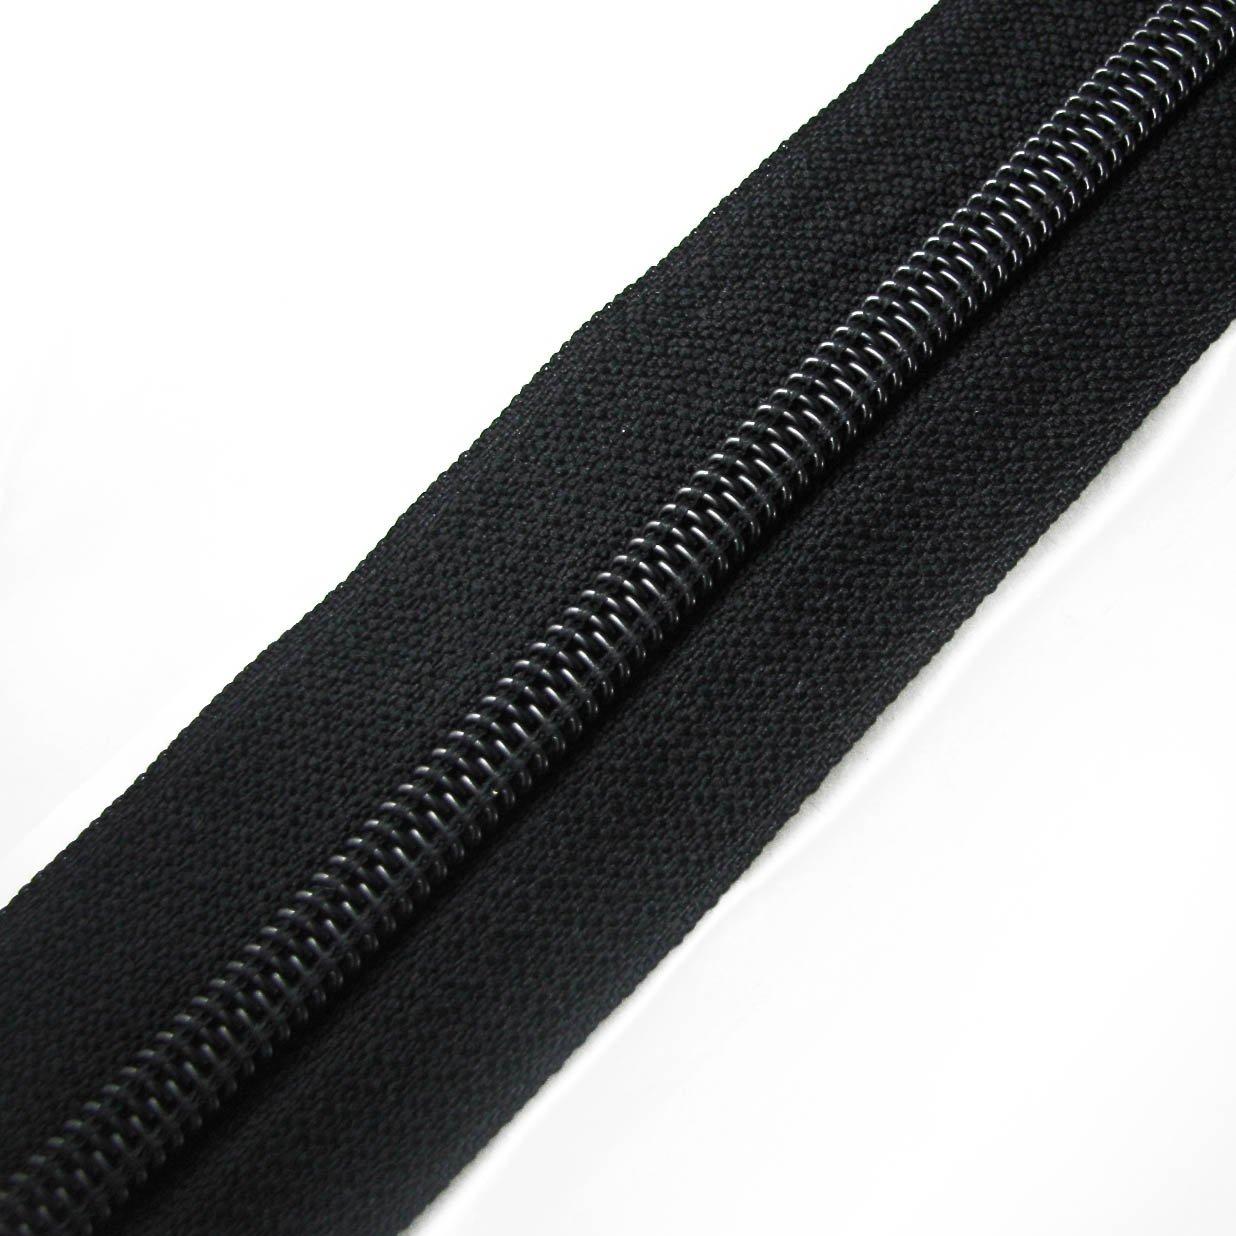 Product Details Nylon Zipper 67